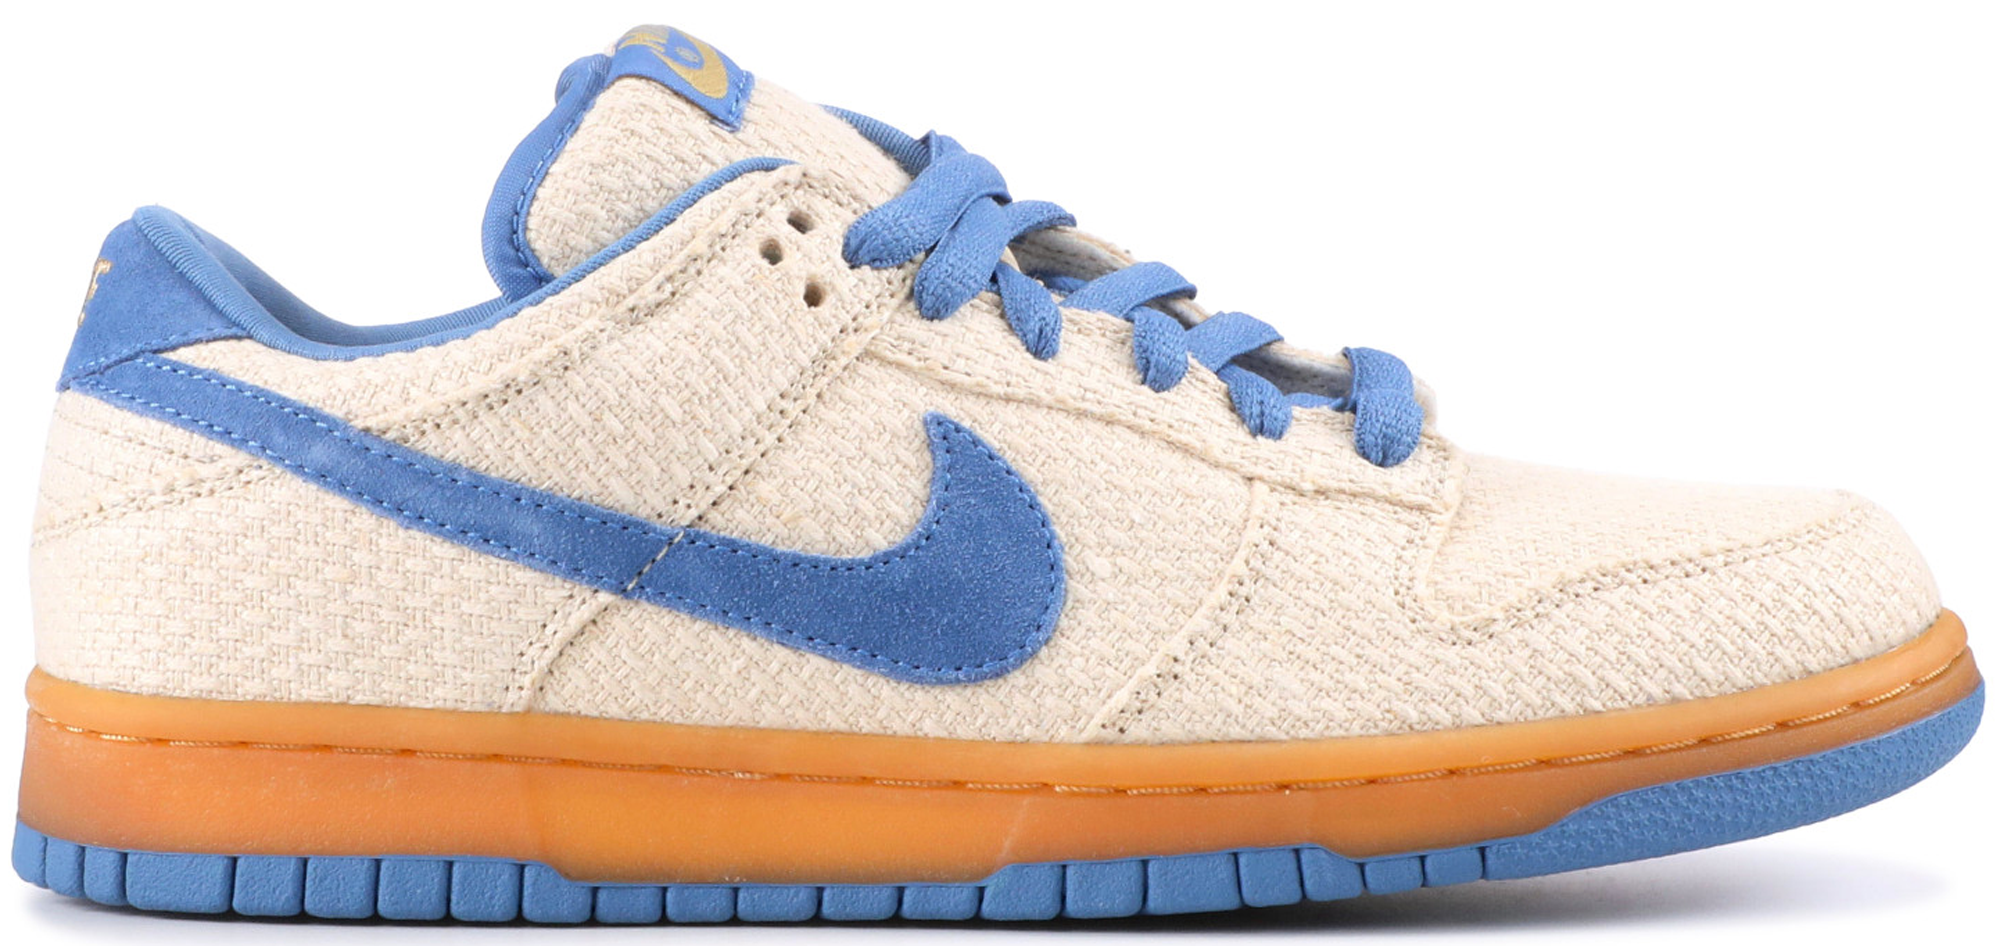 Nike SB Dunk Low Hemp Blue - 304292-741